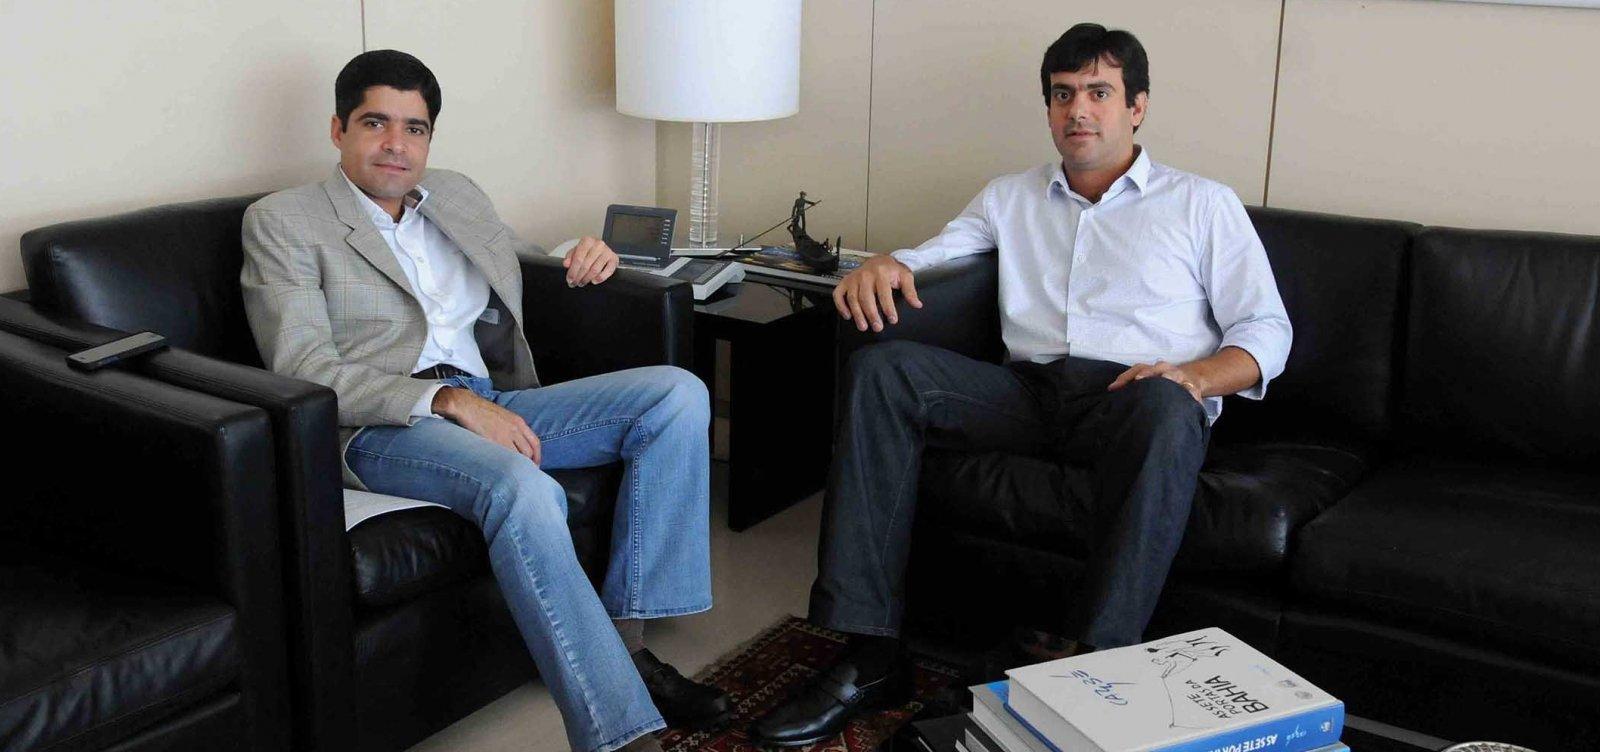 Neto defende 'Lei Tiago Correia': 'Iniciativa legal e constitucional'